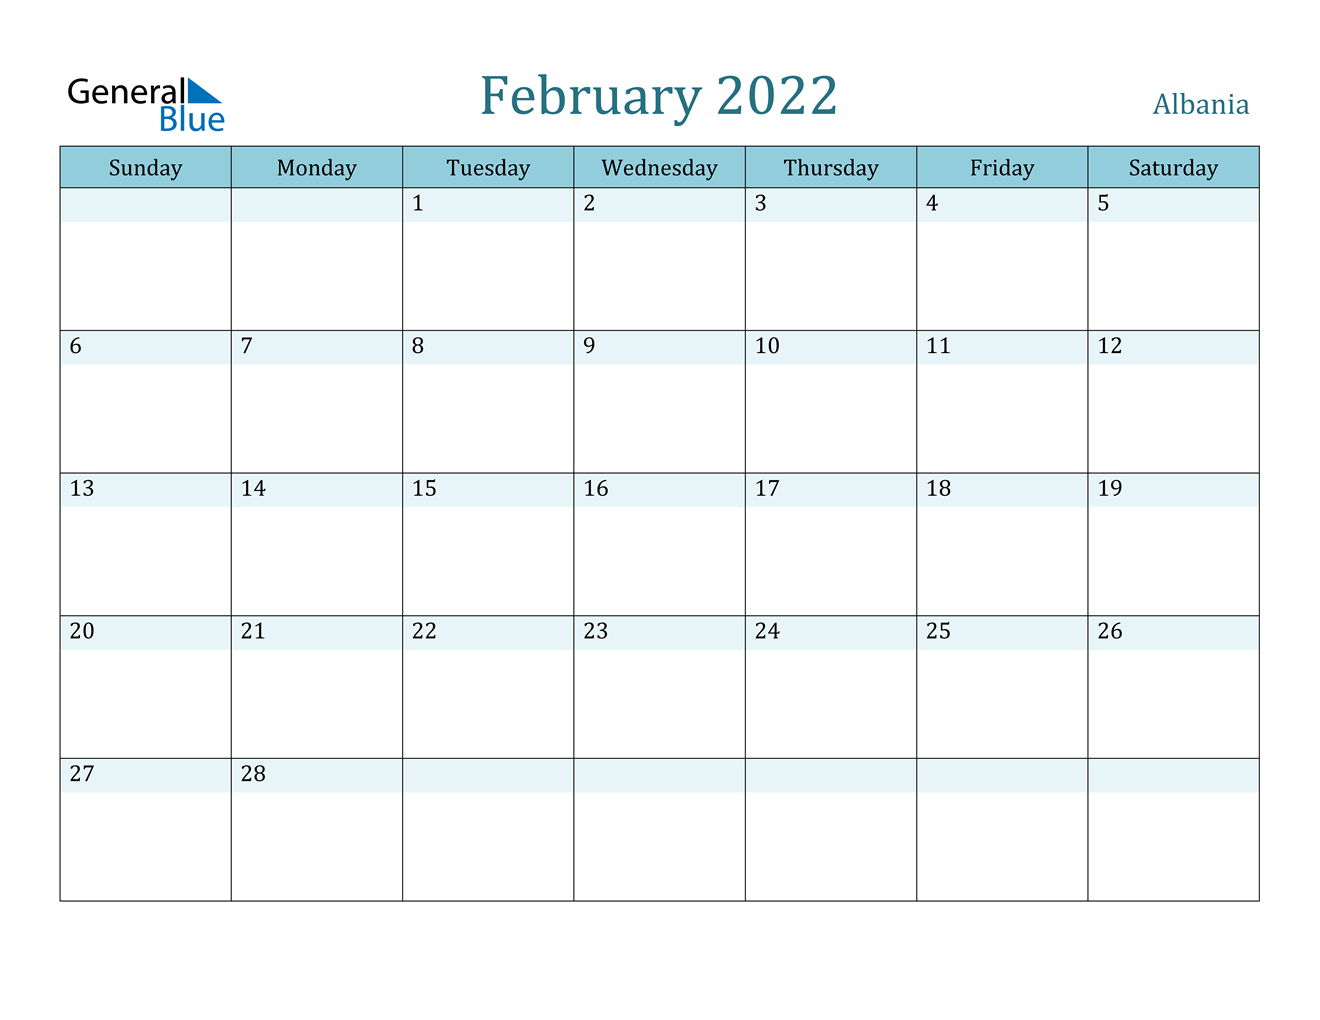 February 2022 Calendar – Albania Throughout Blank Calendar For February 2022